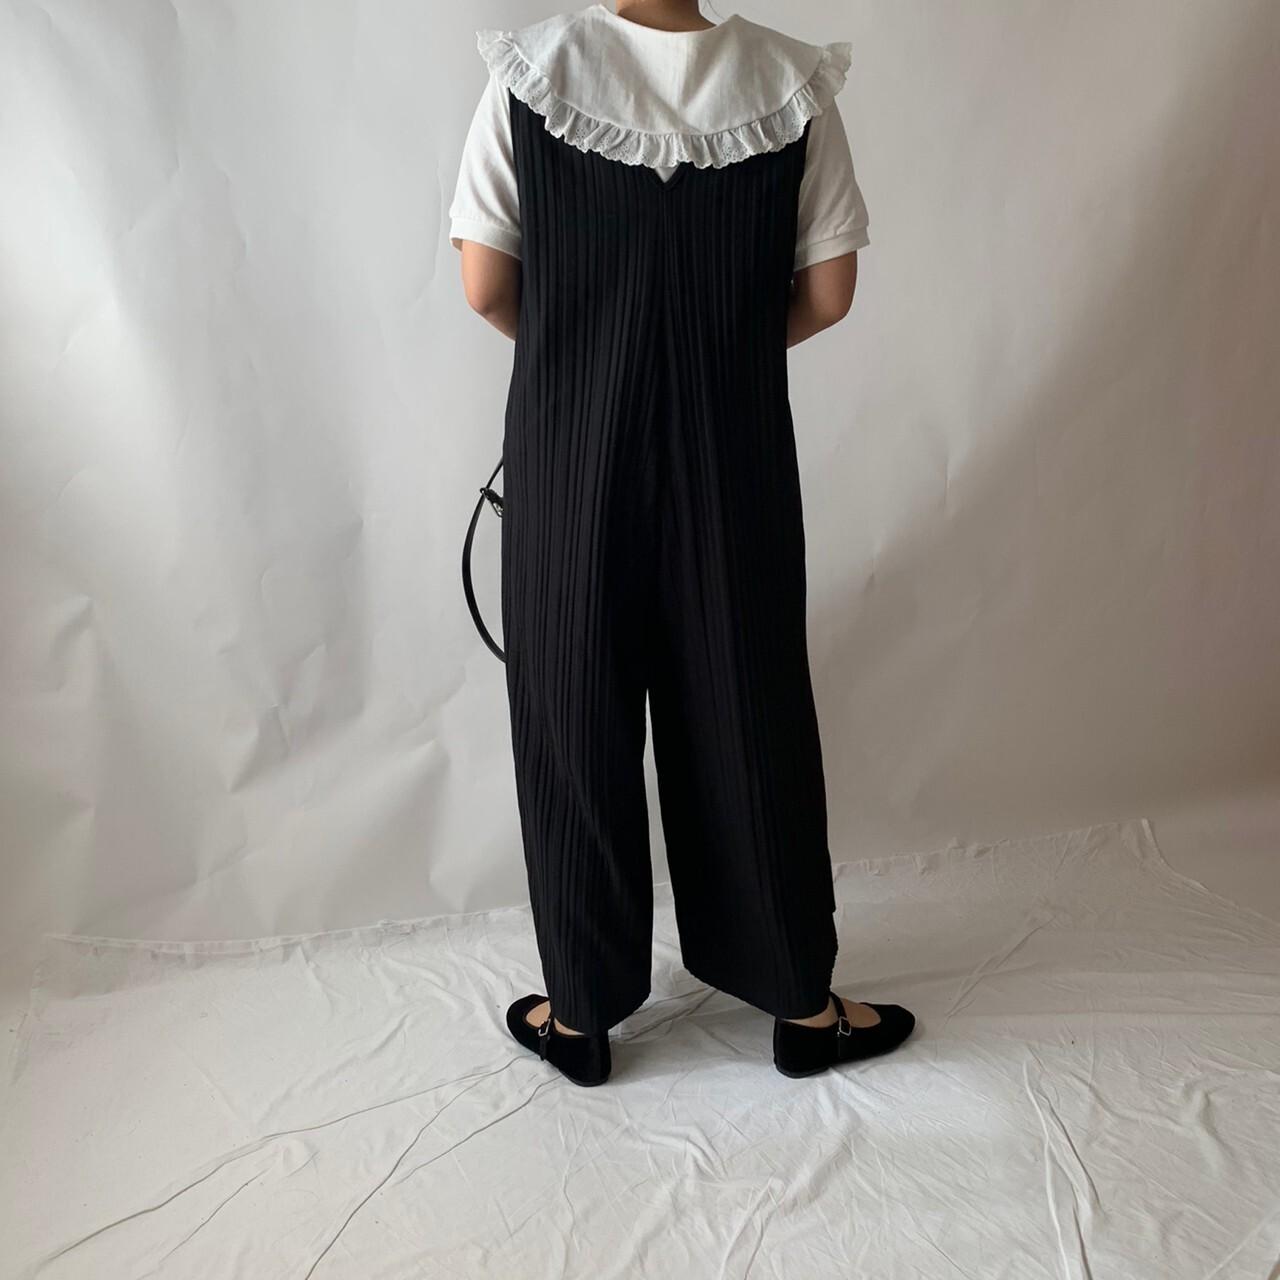 【asyu】pleats salopette